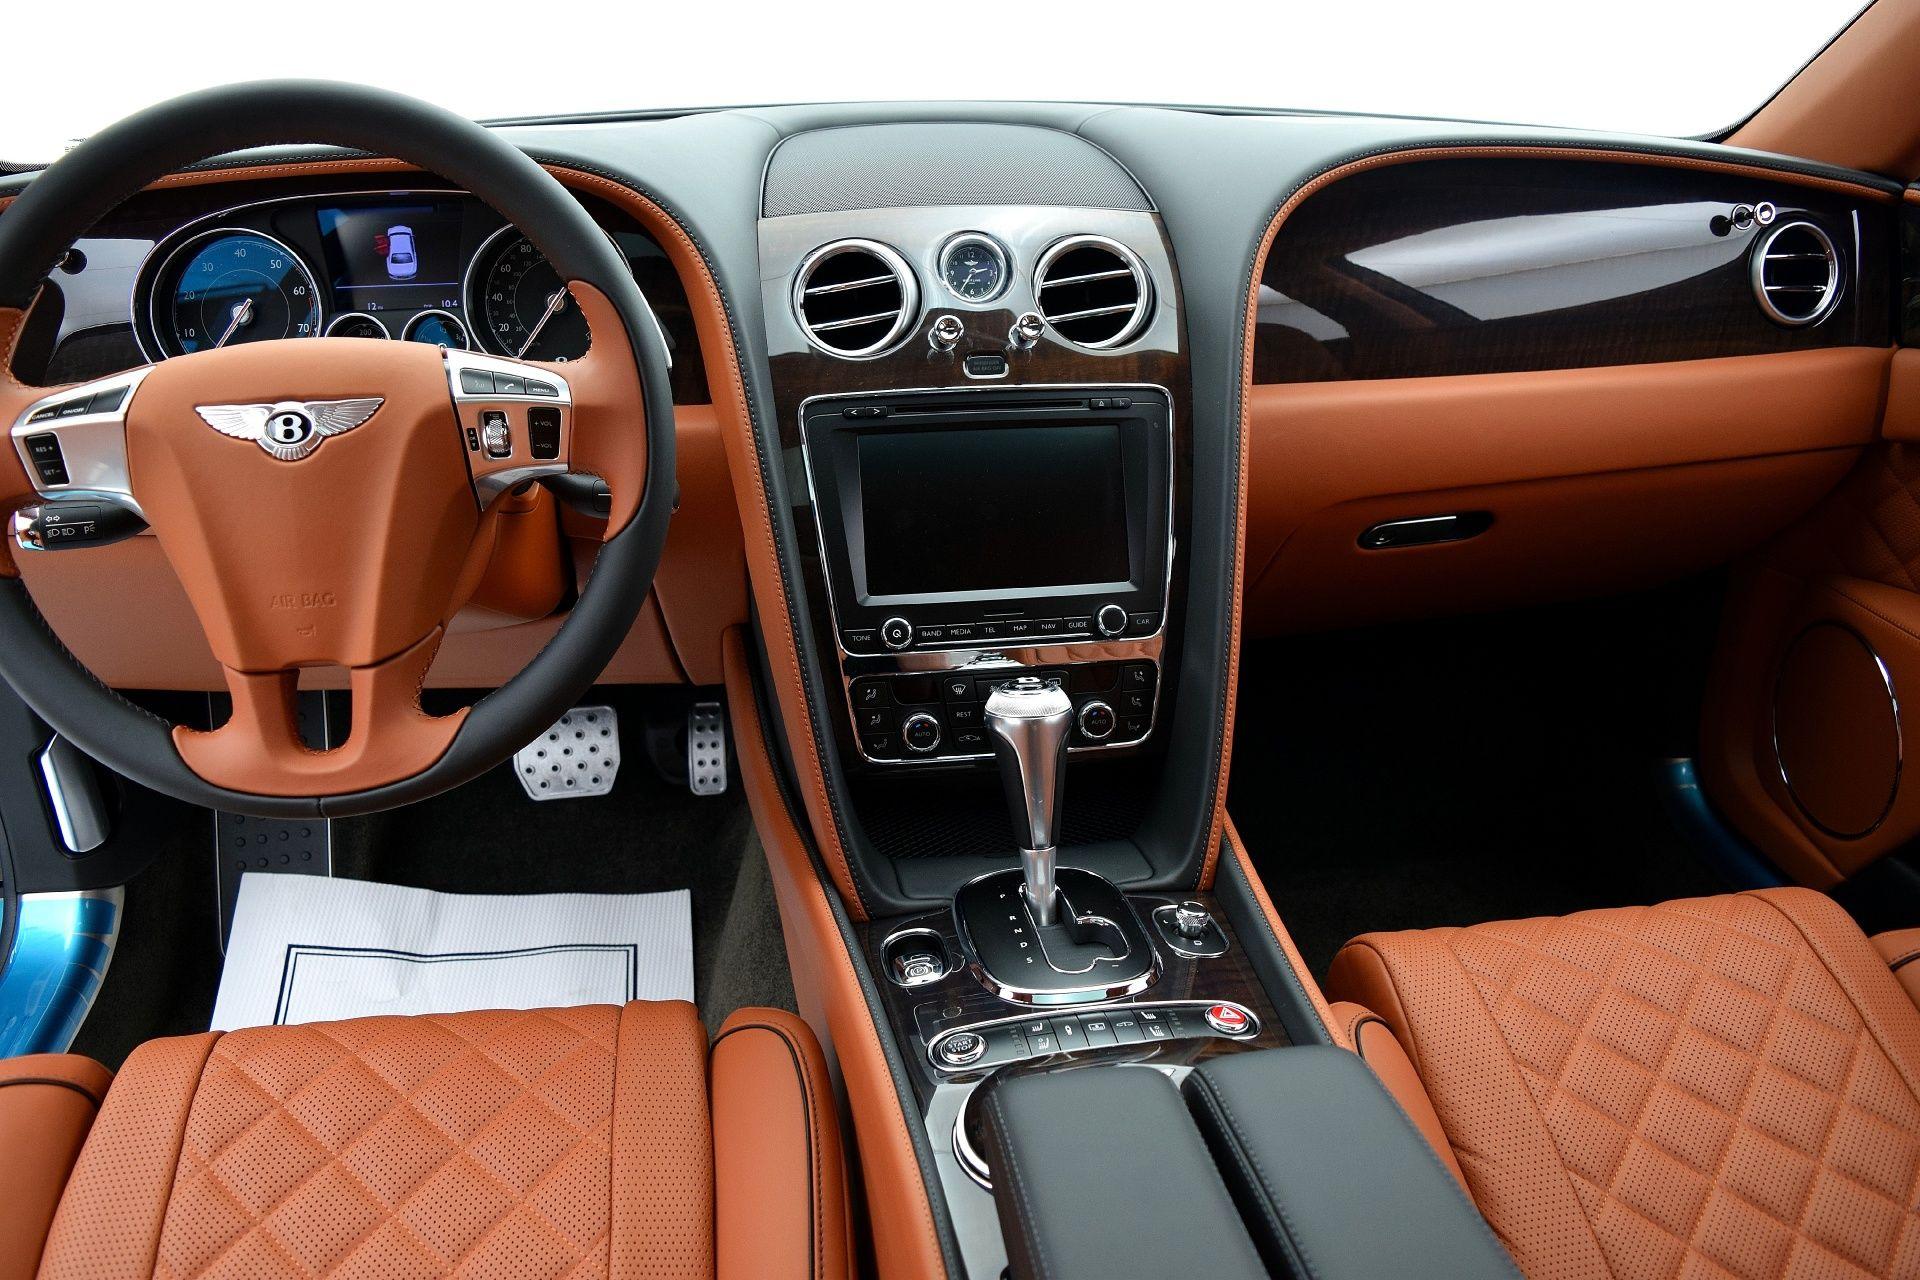 2017 Bentley Flying Spur V8 S Interior Fc Kerbeck Bentley